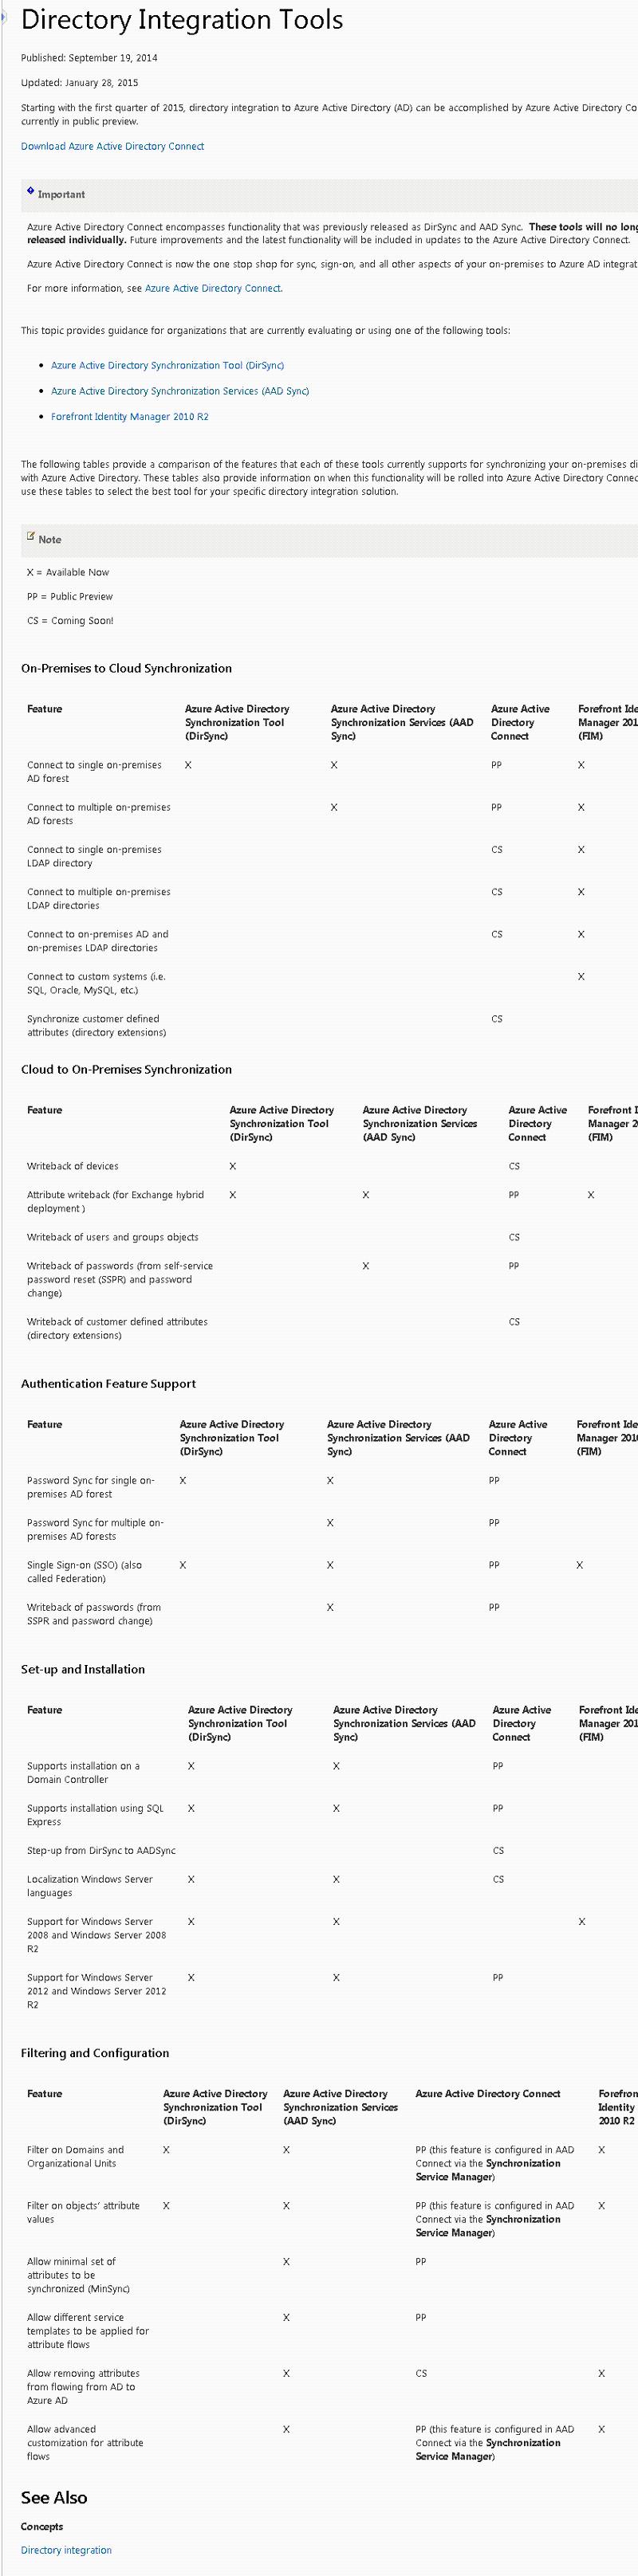 Comparison-of-Microsoft-Azure-Active-Dir